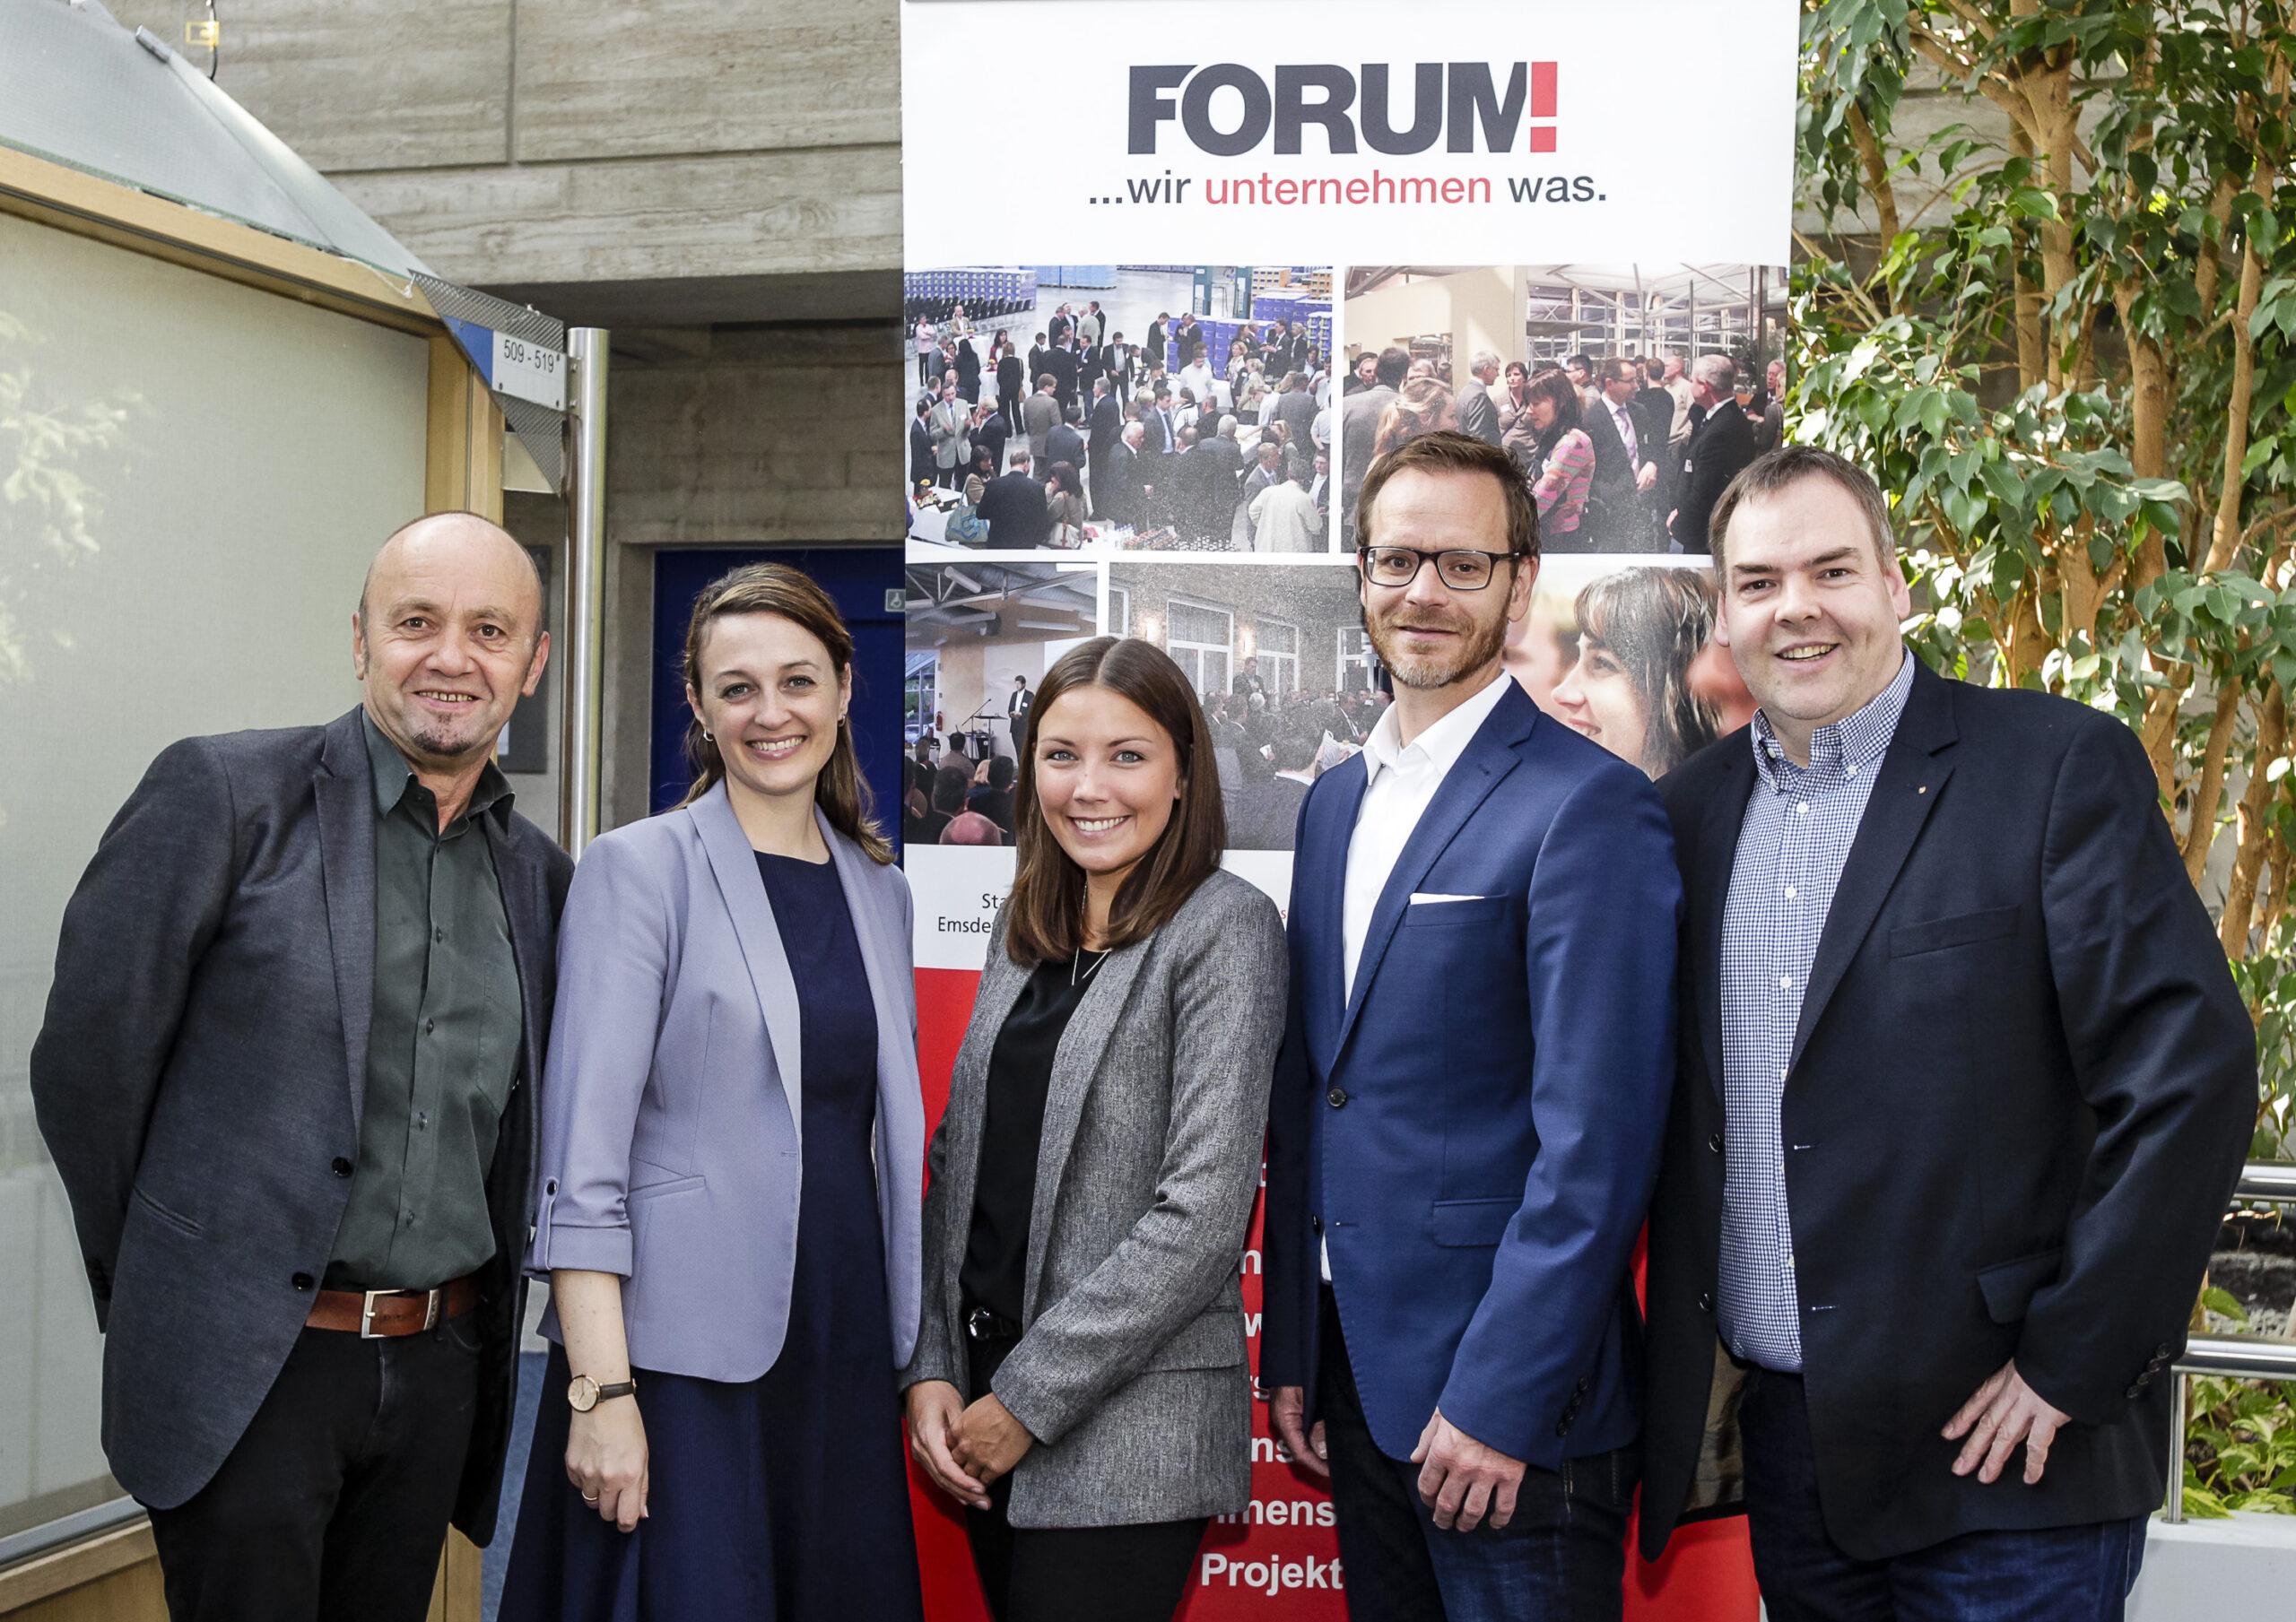 FORUM! Frau Griese übernimmt Ende 2019 von Frau Horstmann